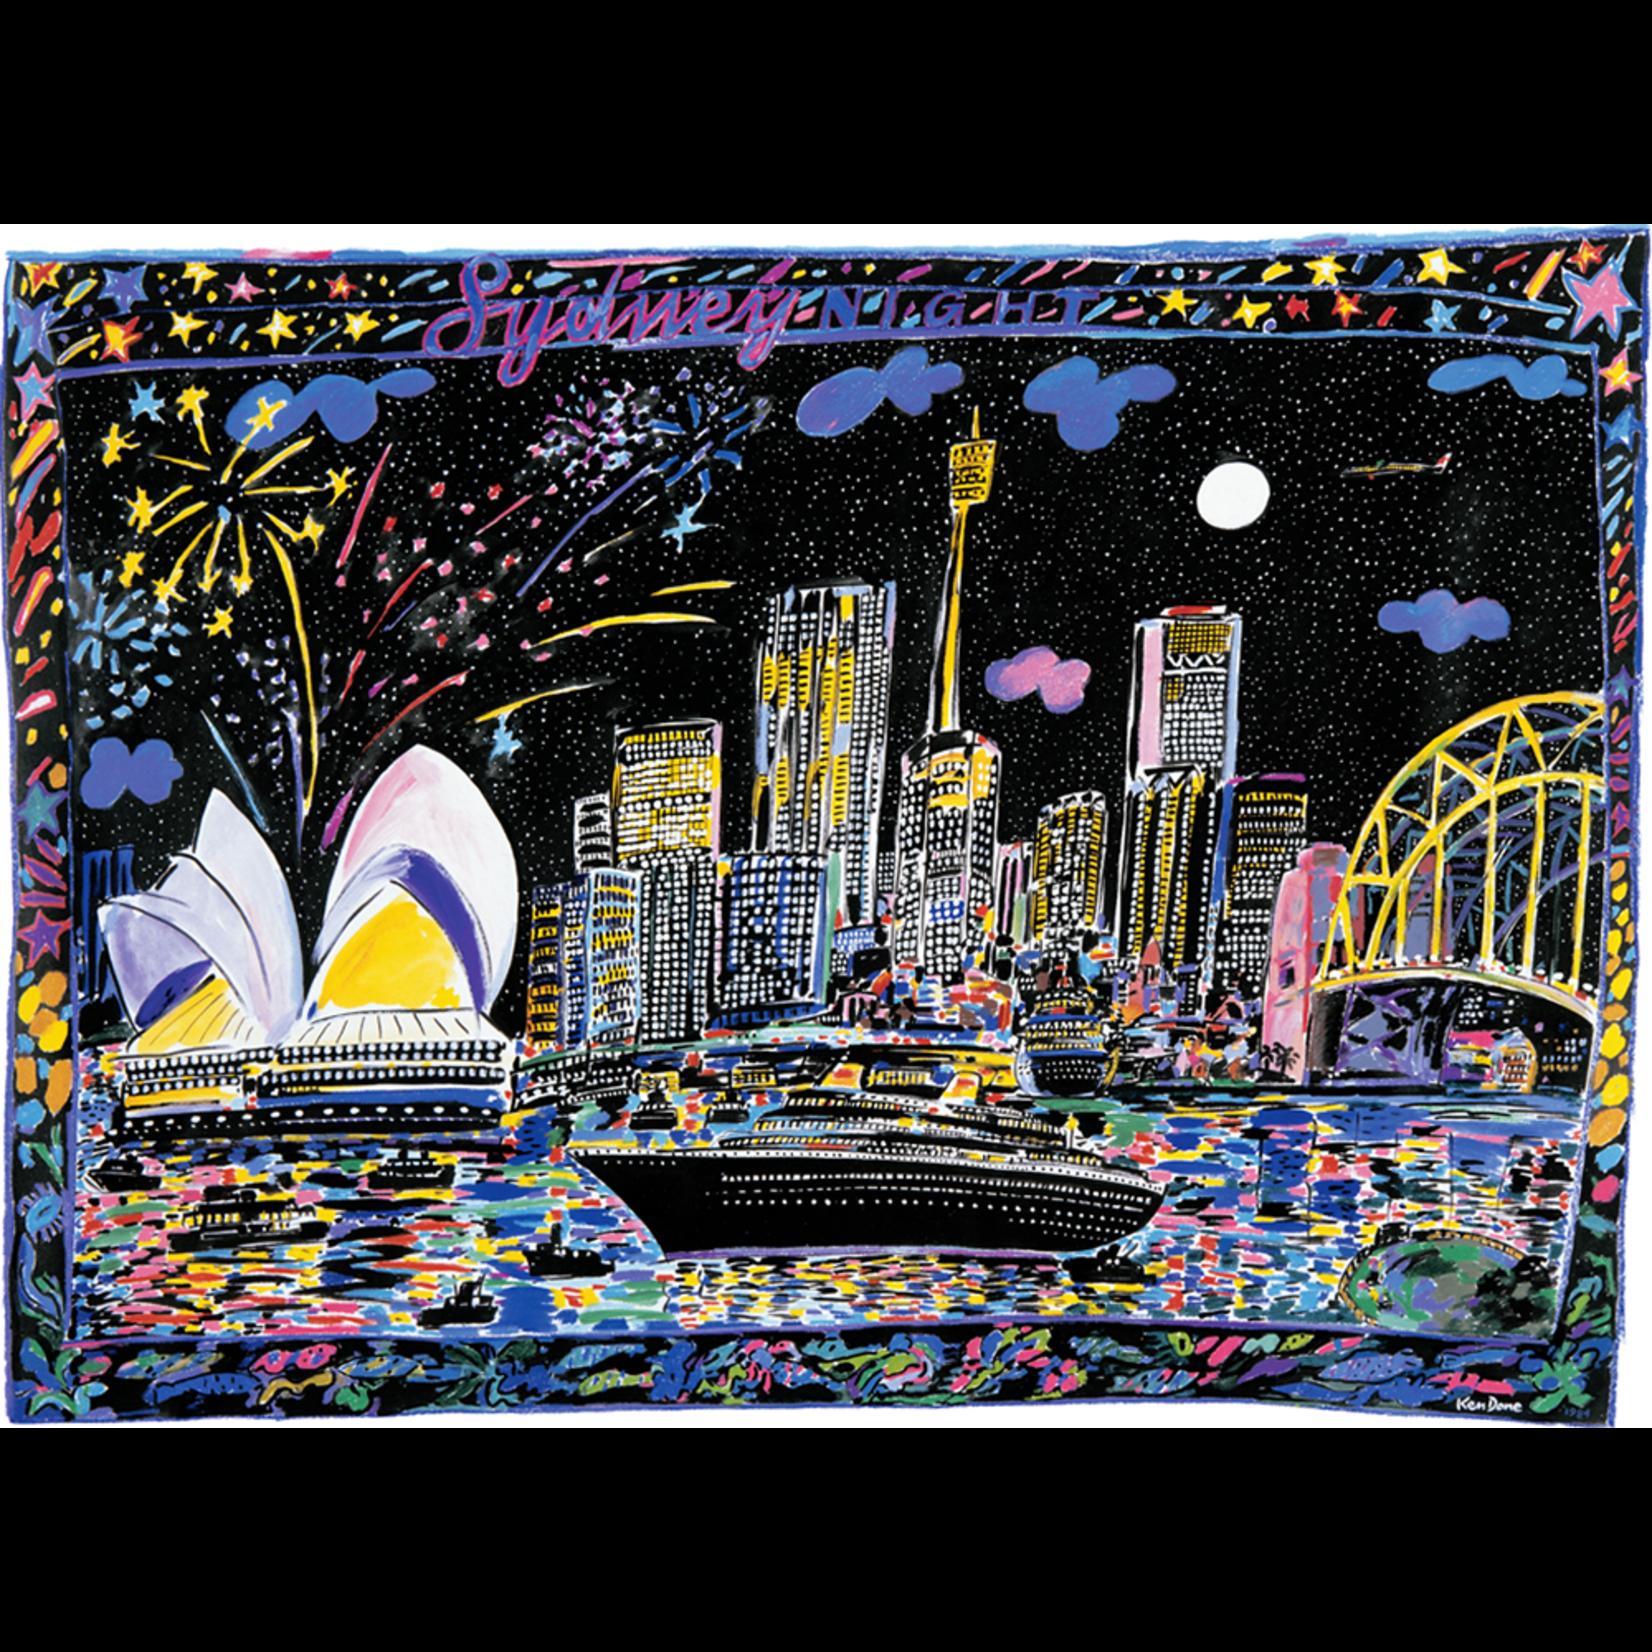 Limited Edition Prints Sydney night, 1984